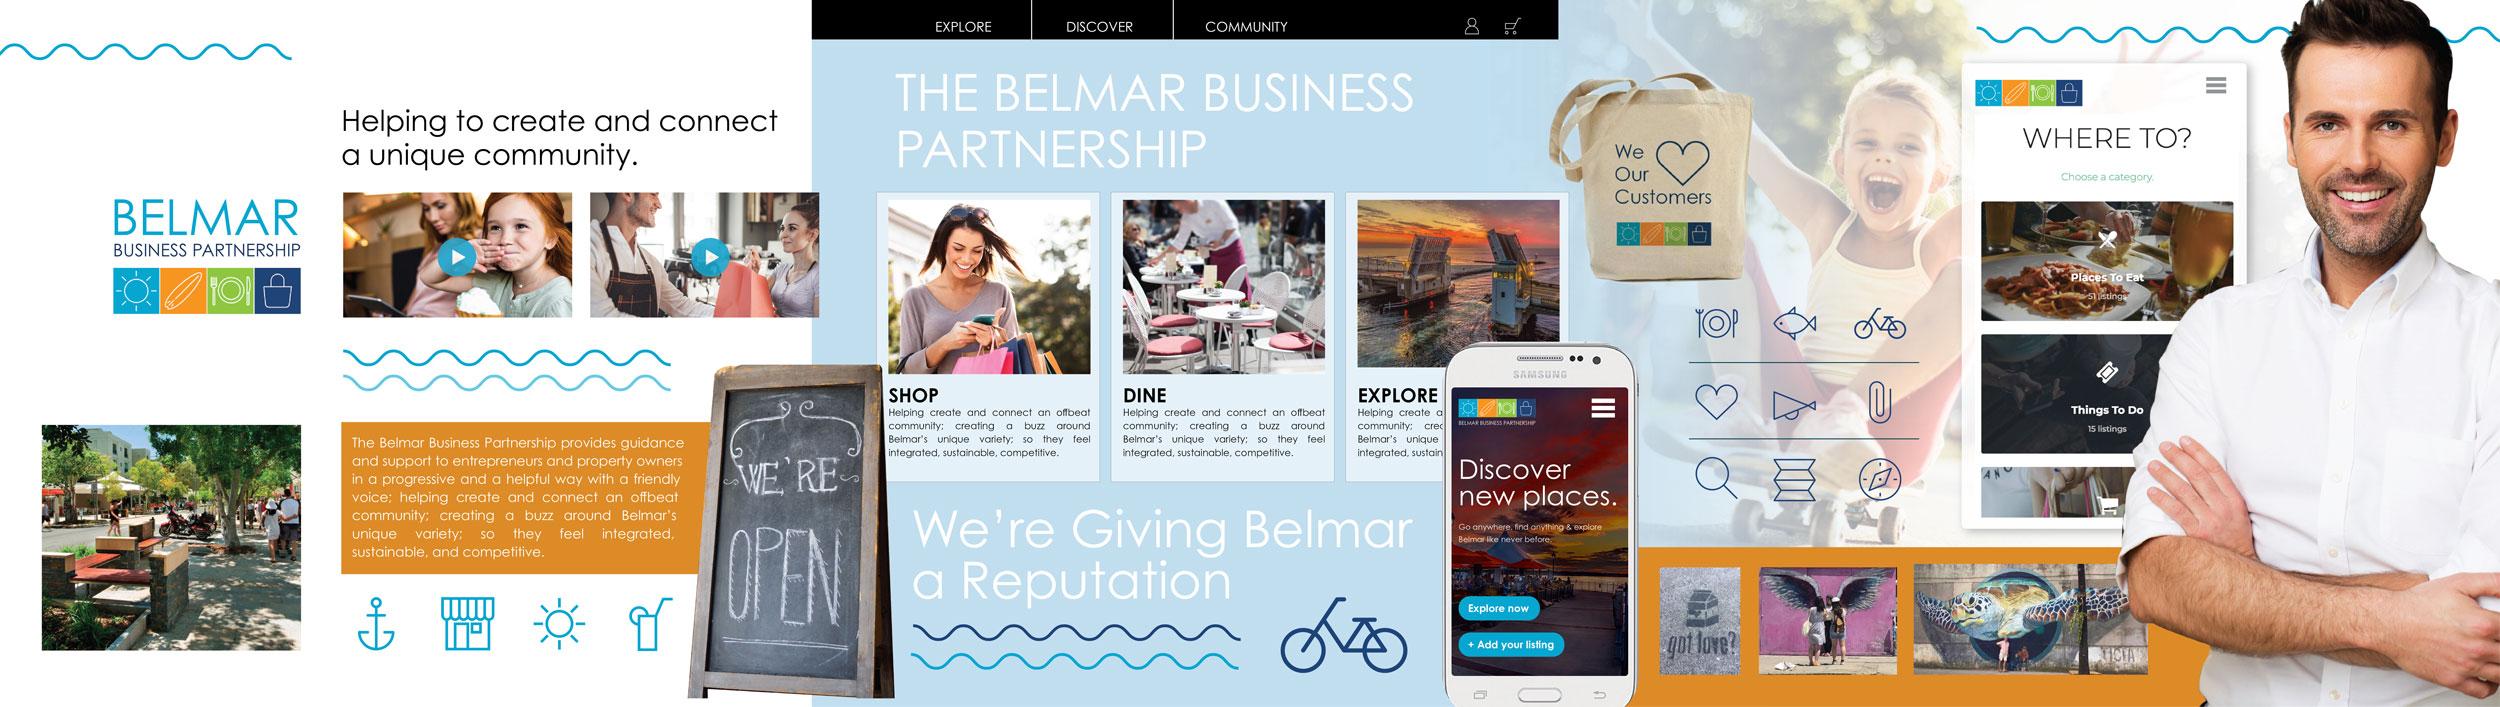 brand-design-capabilities-nj-ny-process-belmar-business-partnership-strategy.jpg